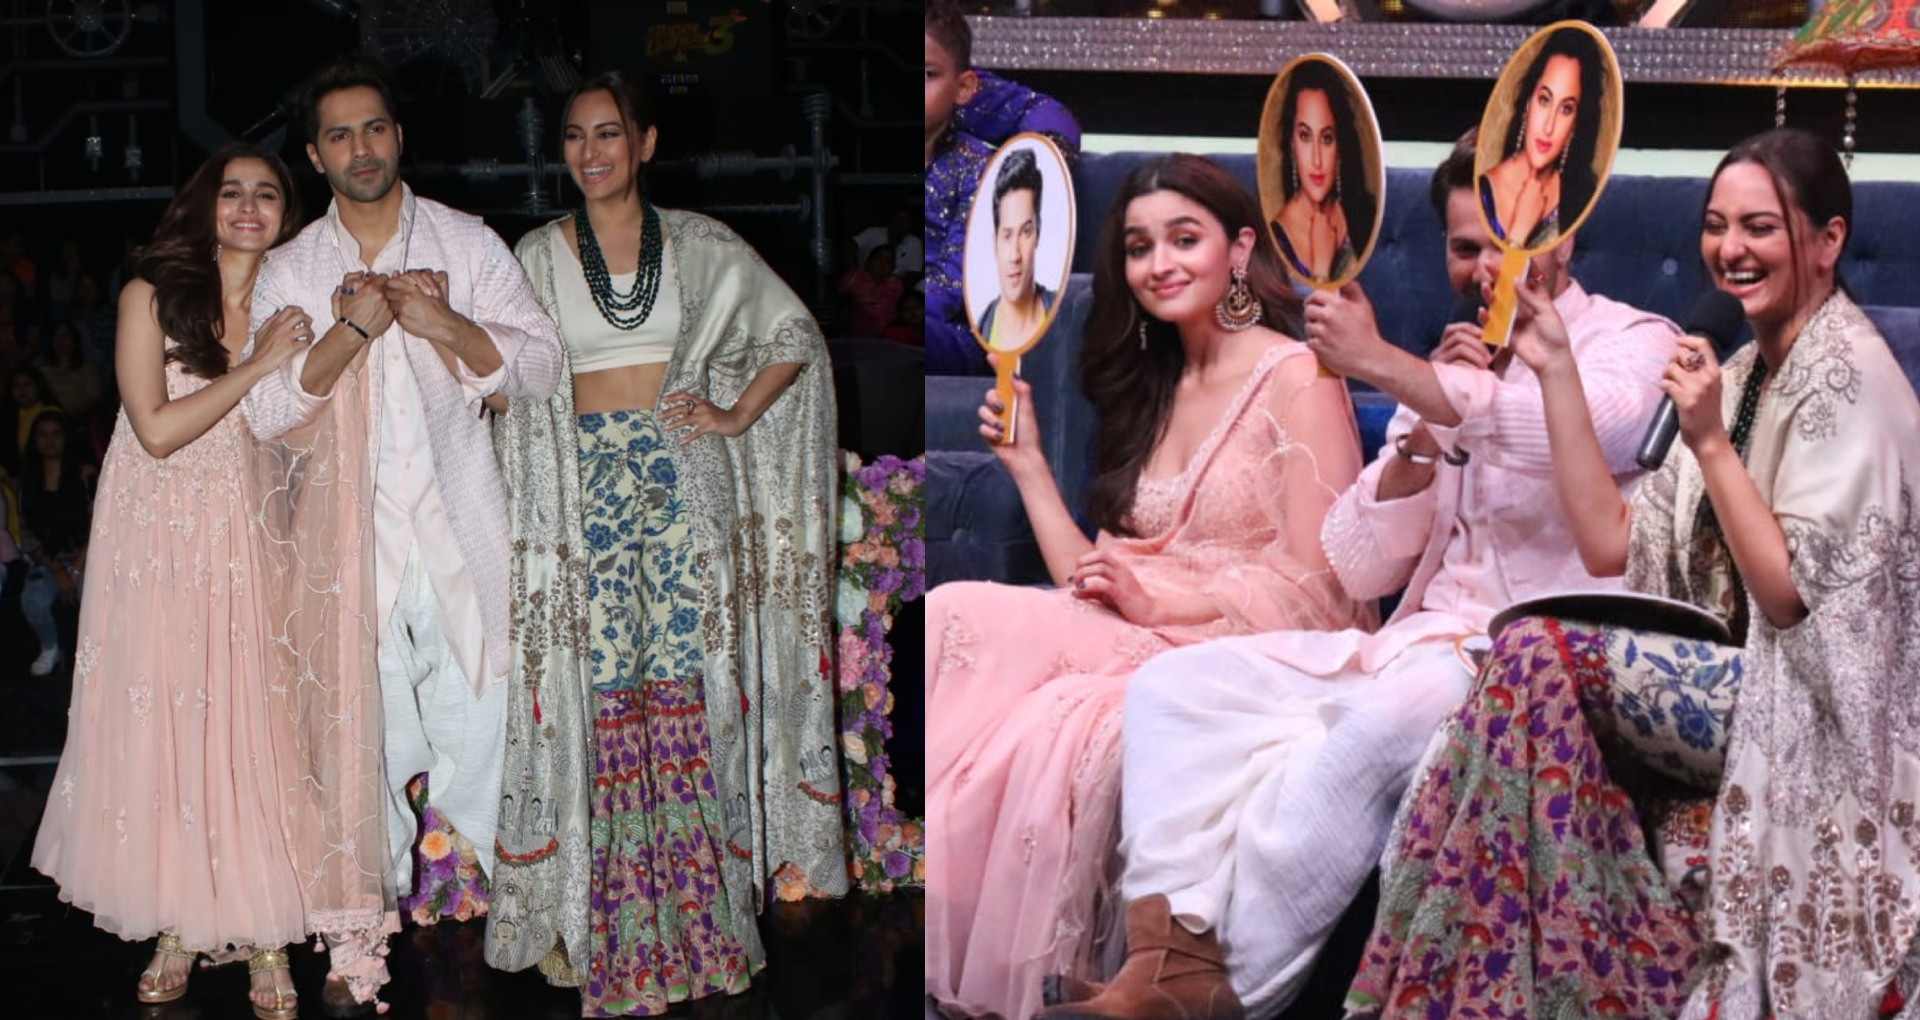 Alia Bhatt, Varun Dhawan and Sonakshi Sinha